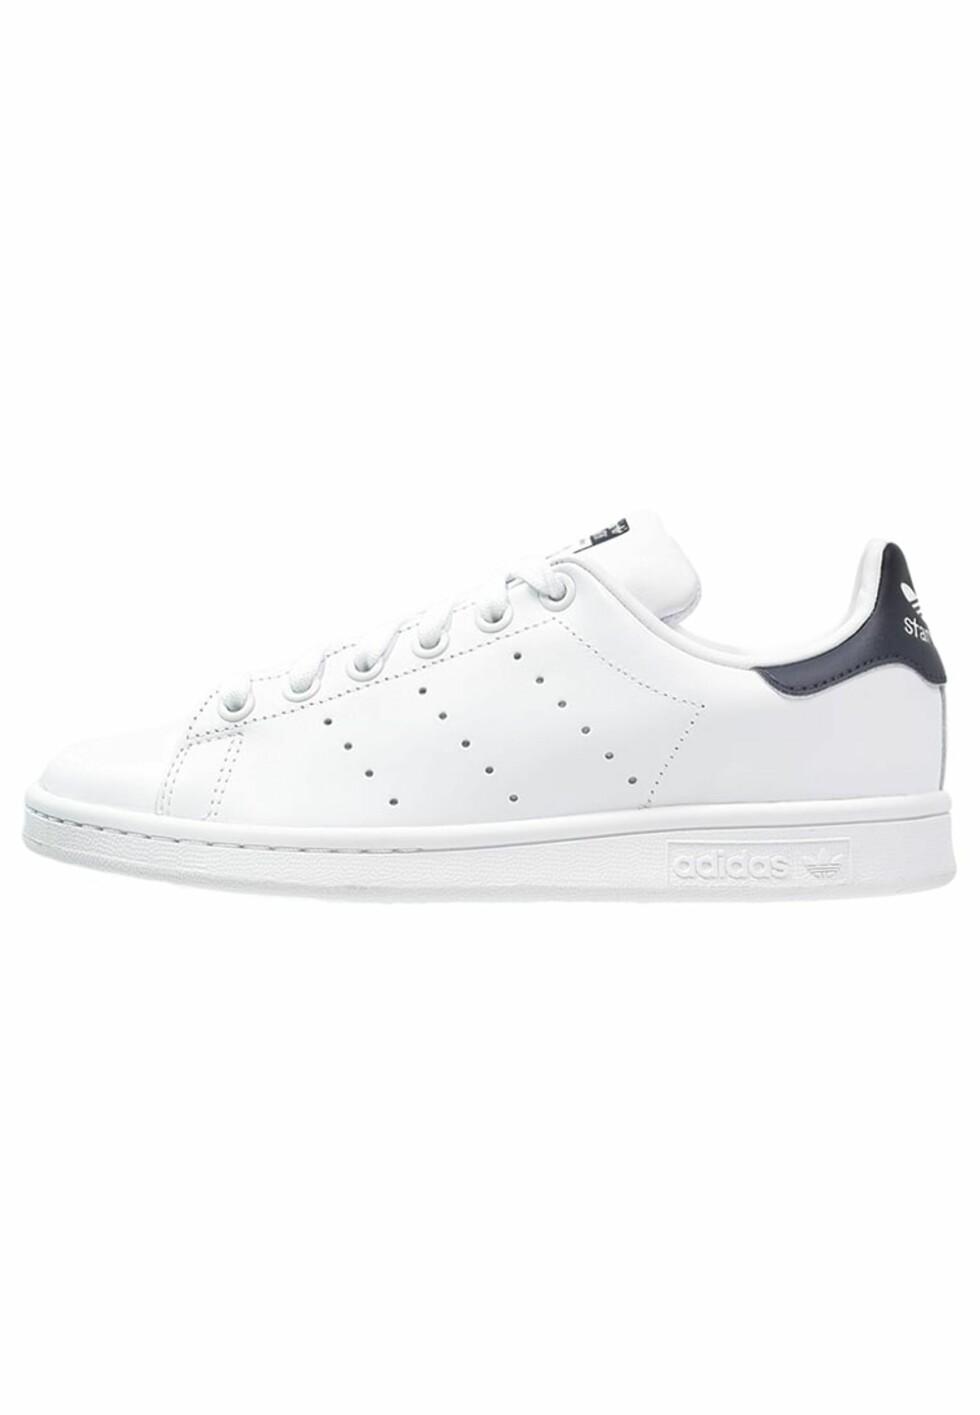 Stan Smith-sneakers fra Adidas med sort detalj via Zalando.no | kr 849 | pn.zalando.net/go.cgi?pid=1173&wmid=cc&cpid=12&target=http://www.zalando.no/adidas-originals-stan-smith-joggesko-hvit-ad115b01k-a11.html